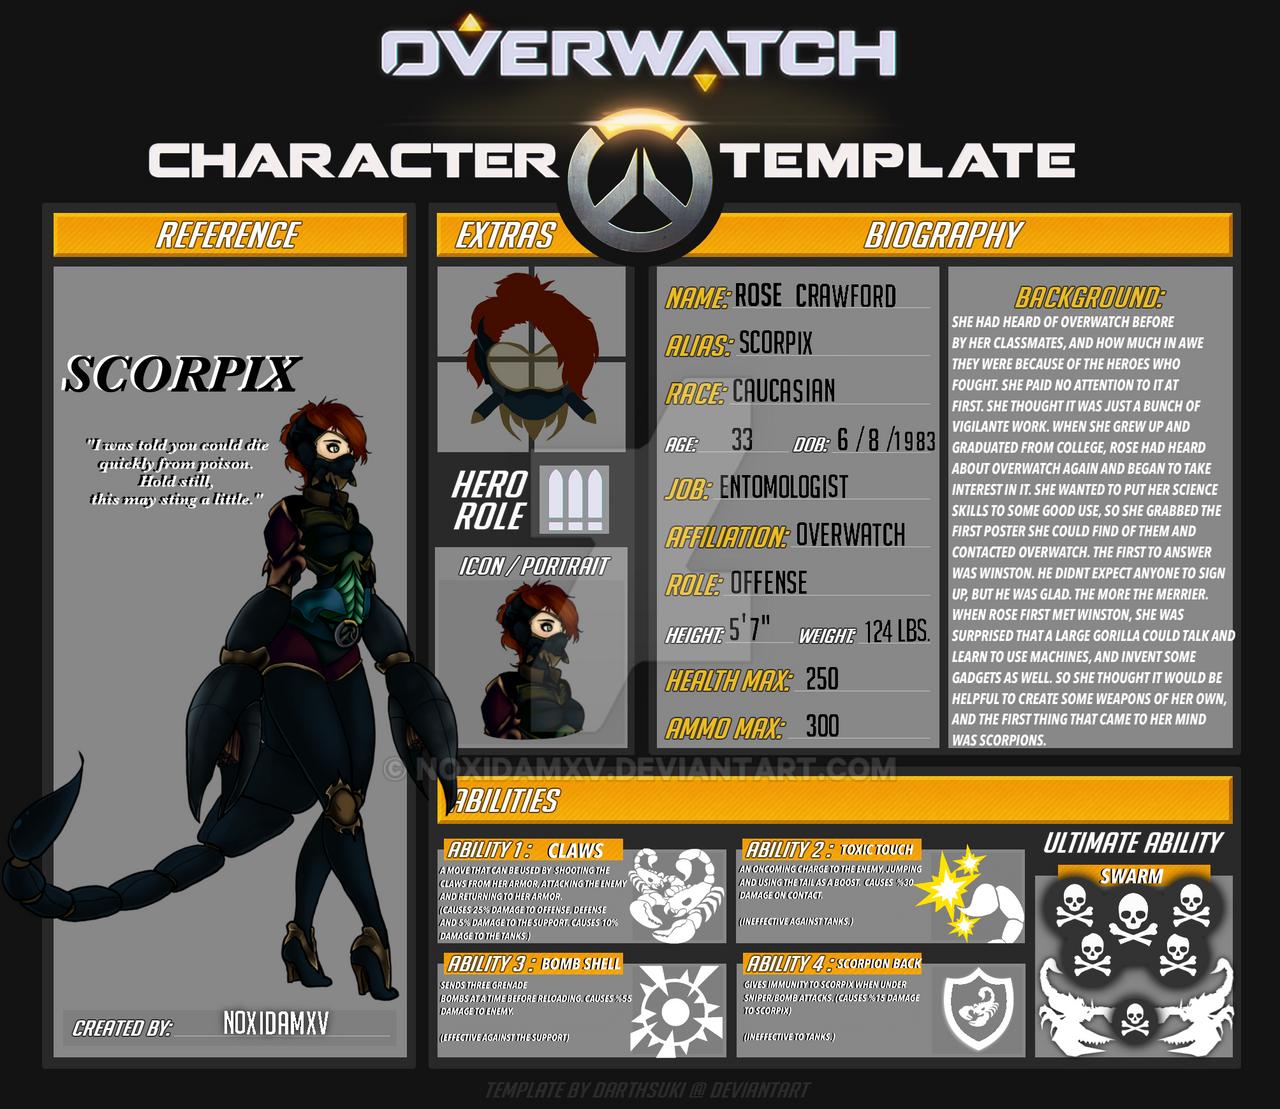 Overwatch oc: Scorpix by NoxidamXV